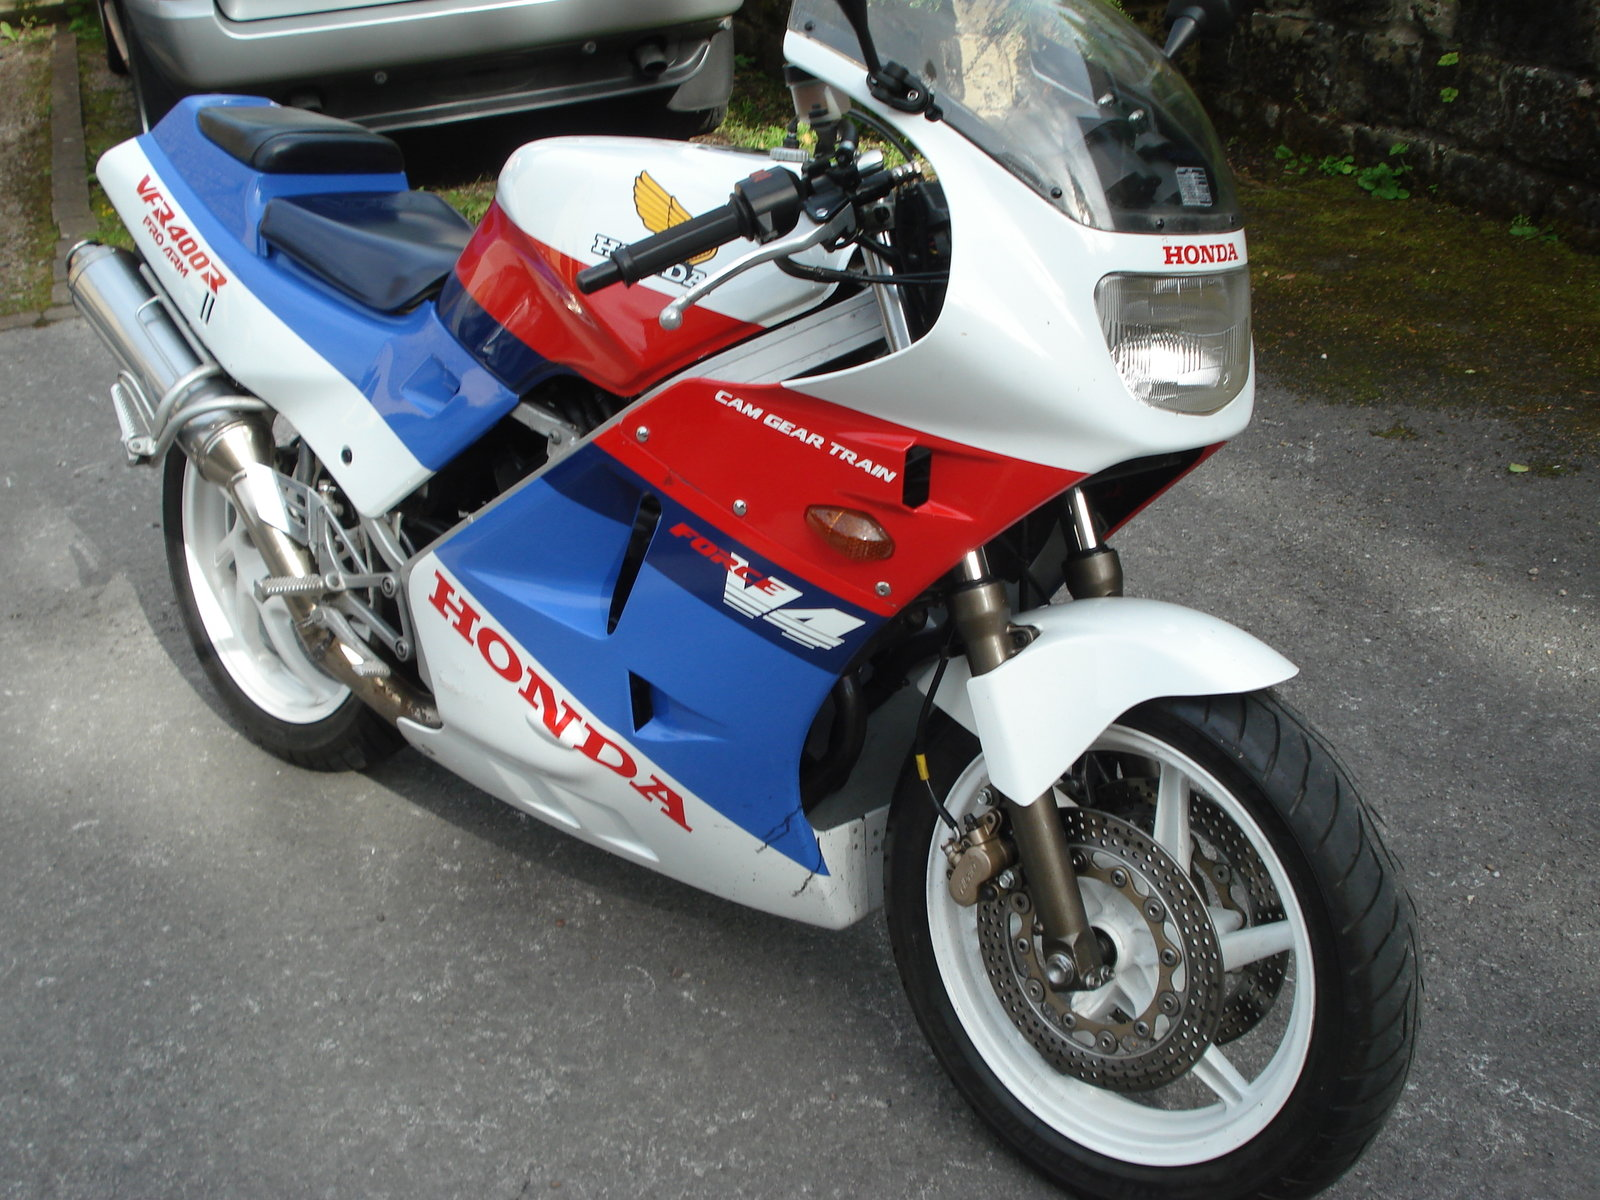 DSC03692.JPG